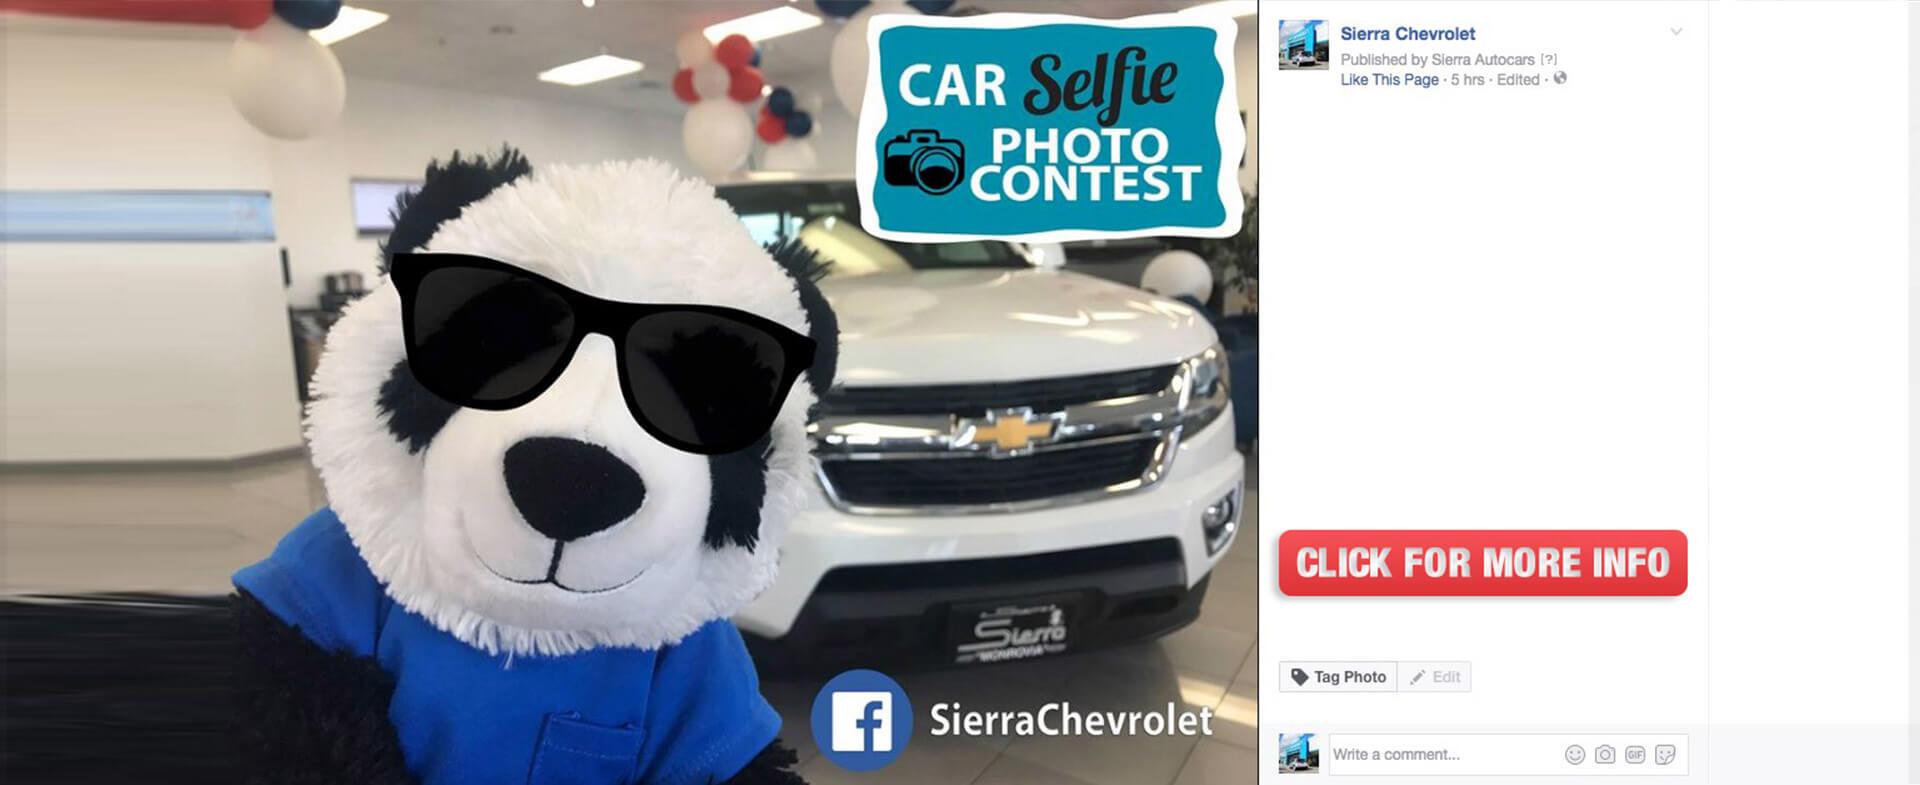 Car Selfie Photo Contest